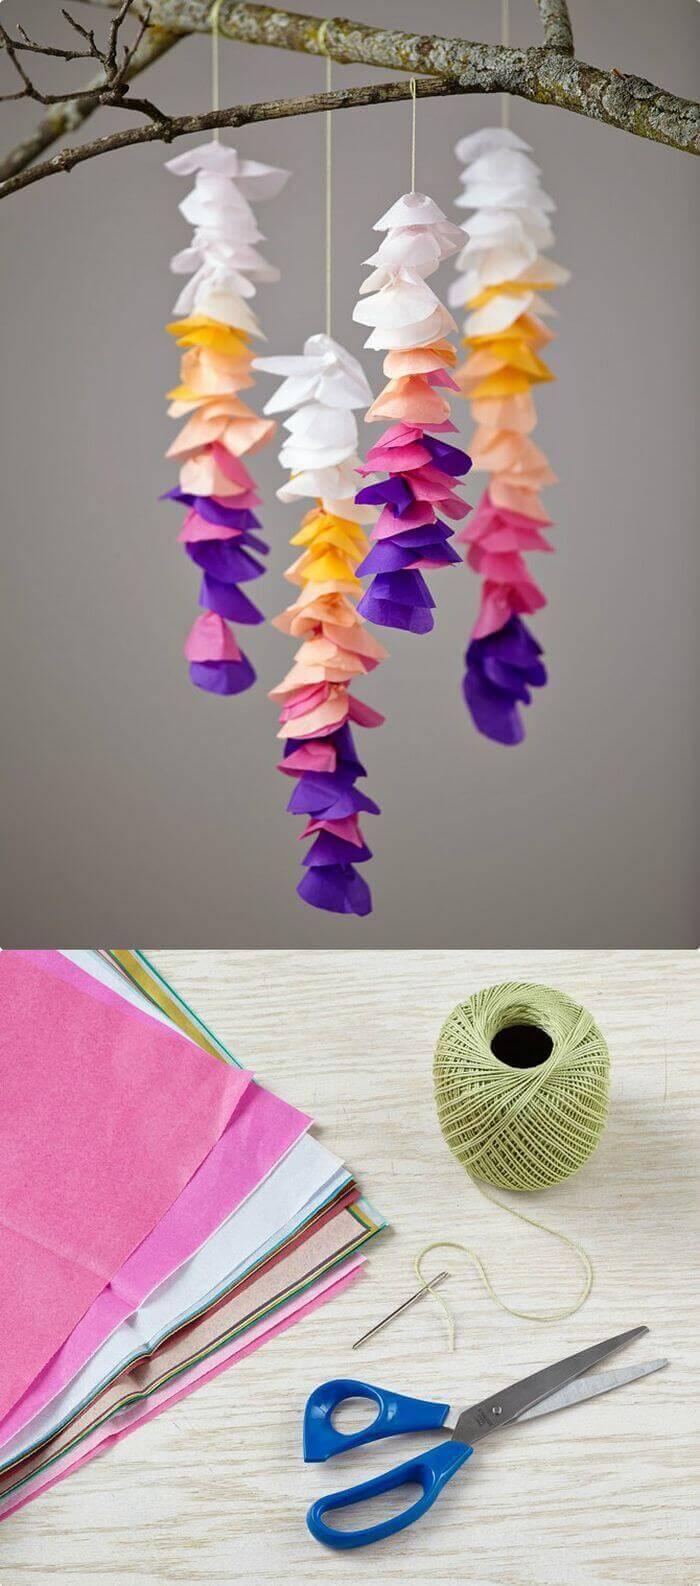 DIY Tissue Wisteria